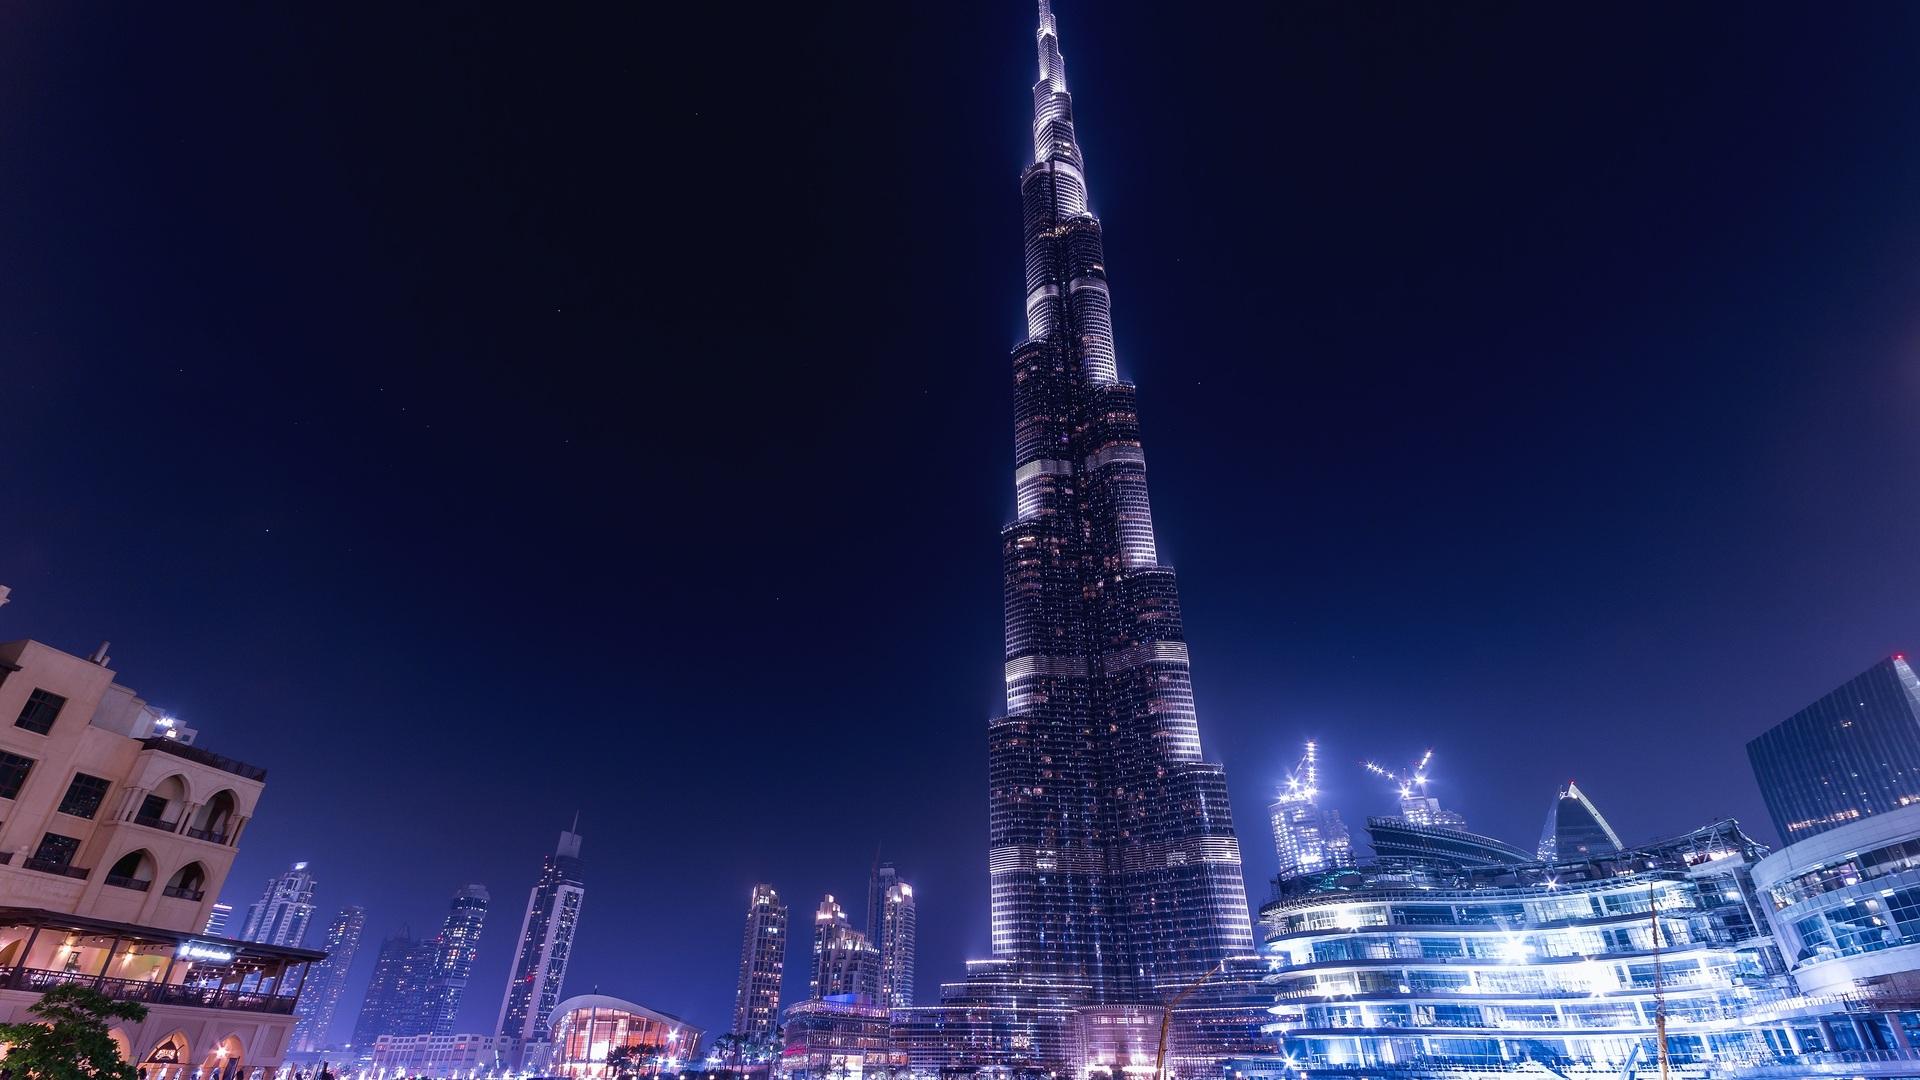 1920x1080 burj khalifa dubai night laptop full hd 1080p hd - Dubai burj khalifa hd wallpaper ...